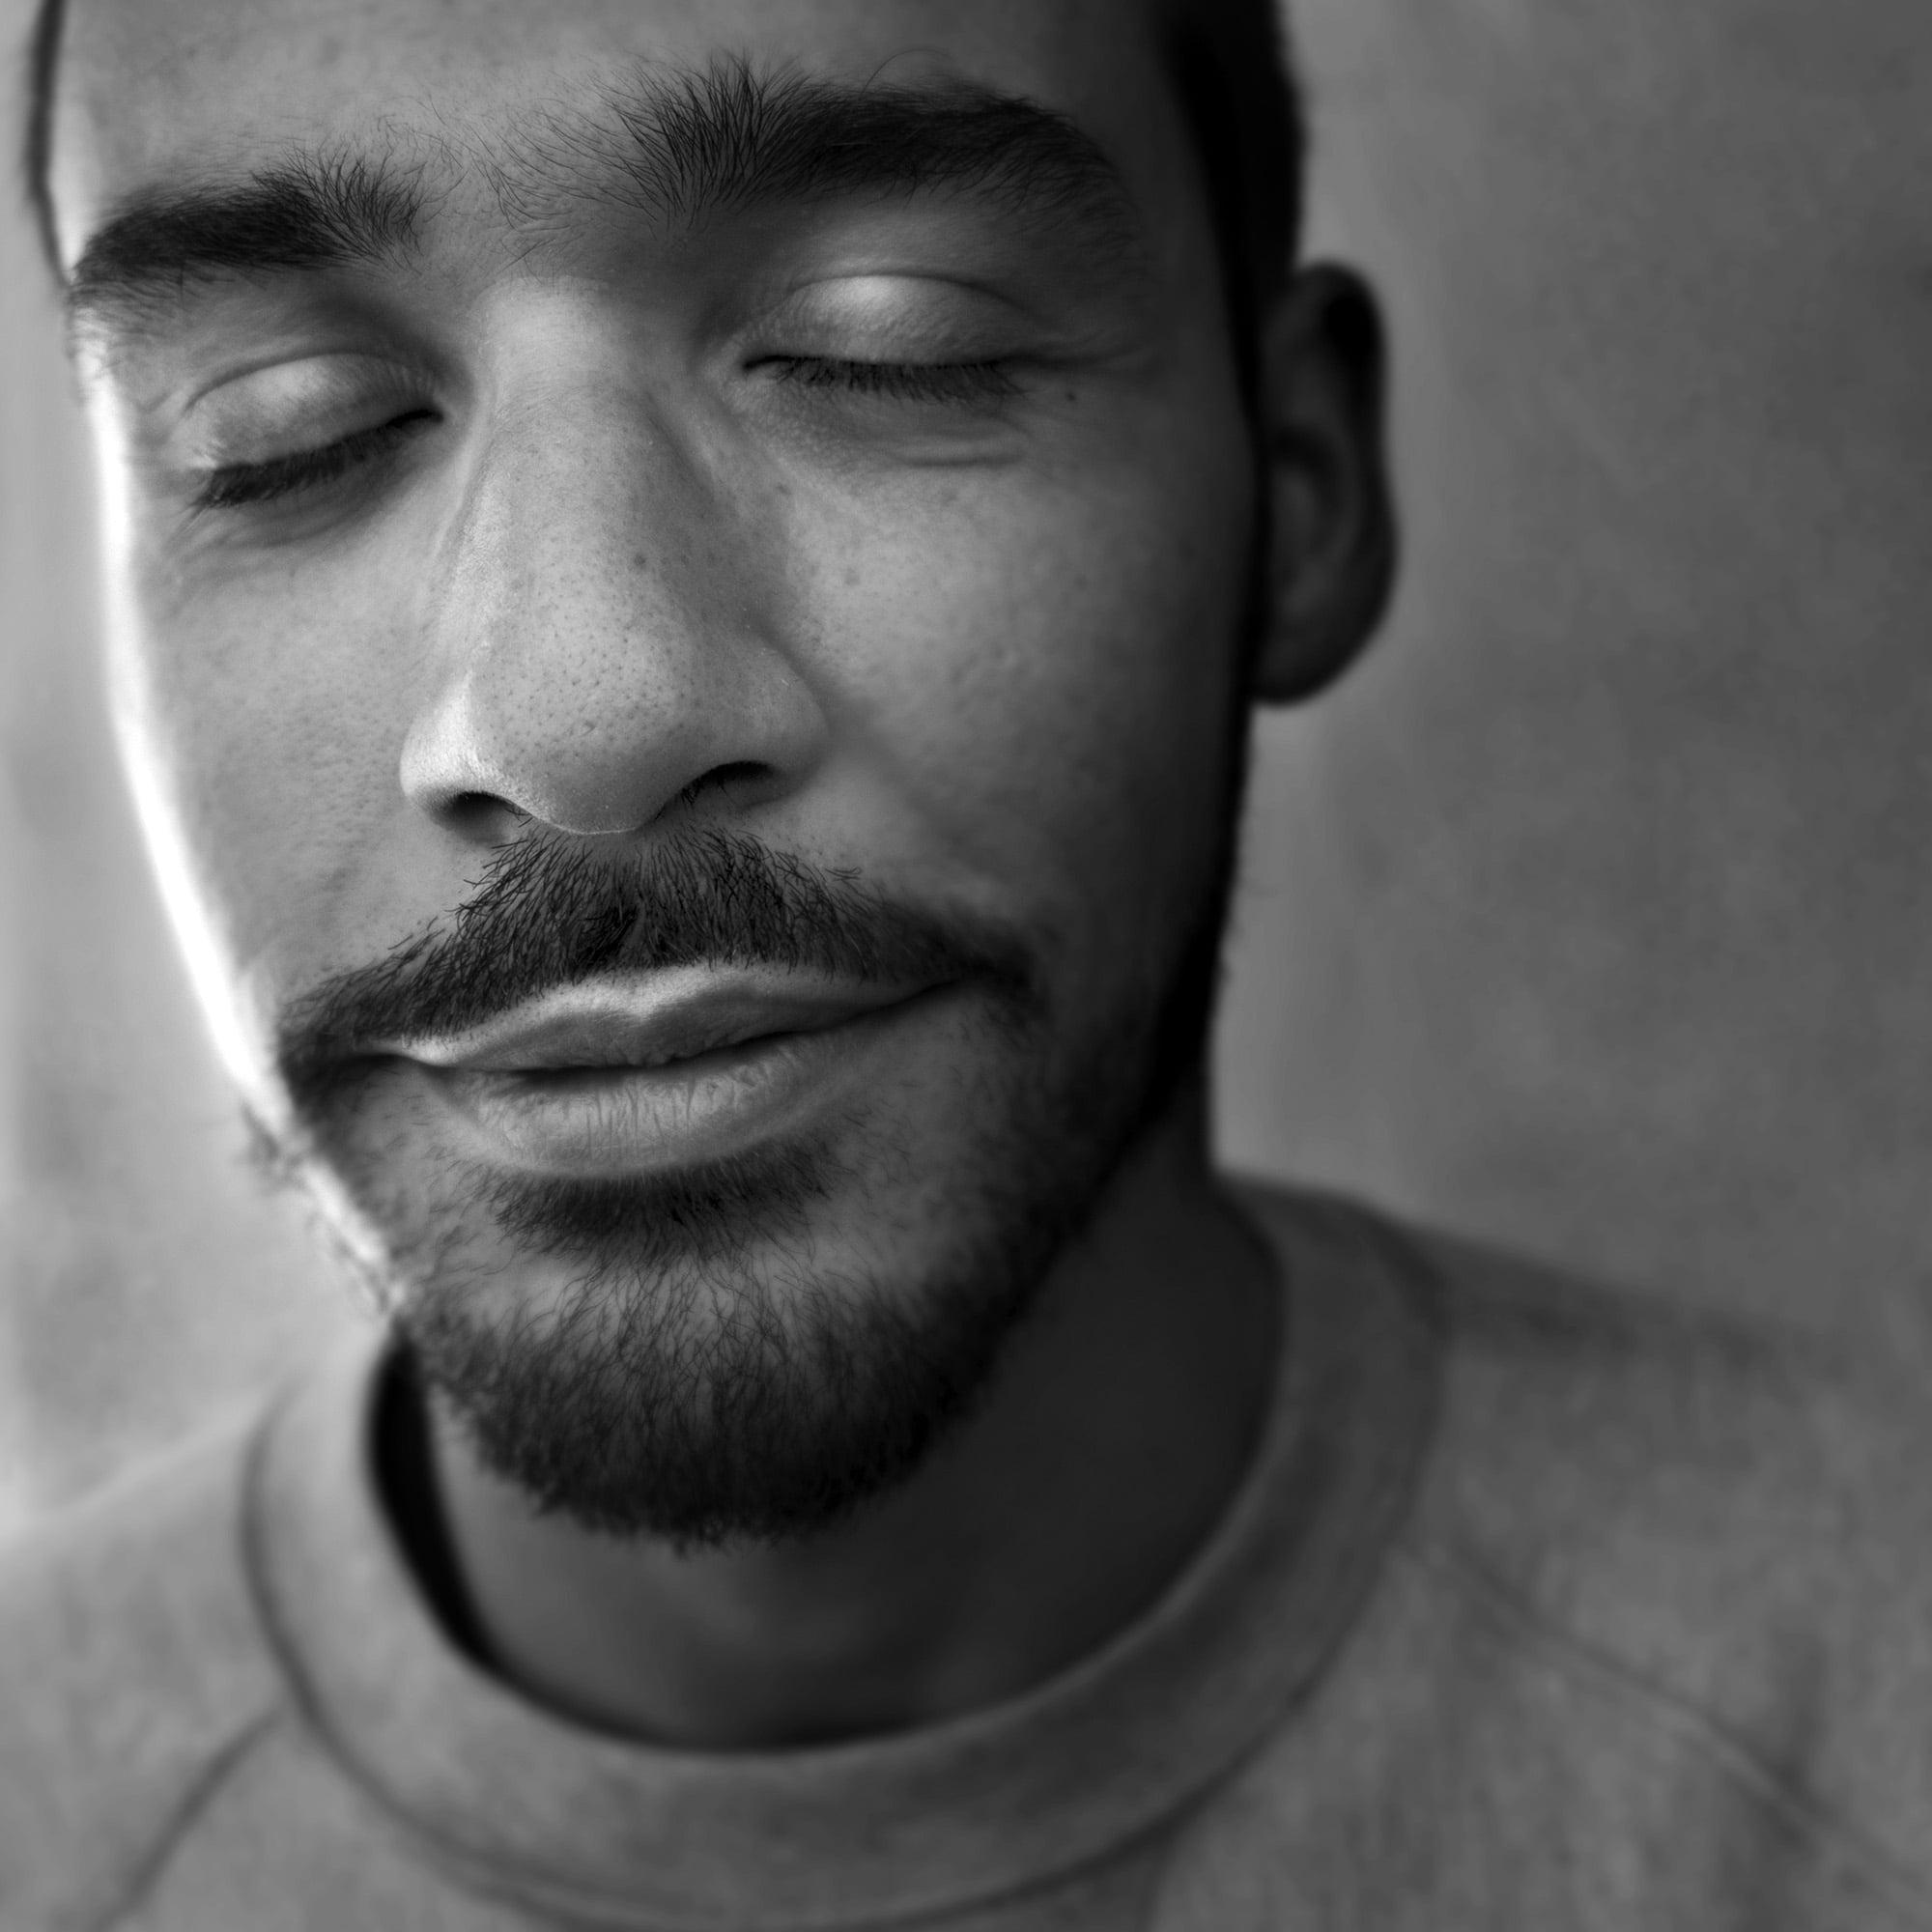 Karim Sayad | Of Sheep and Men